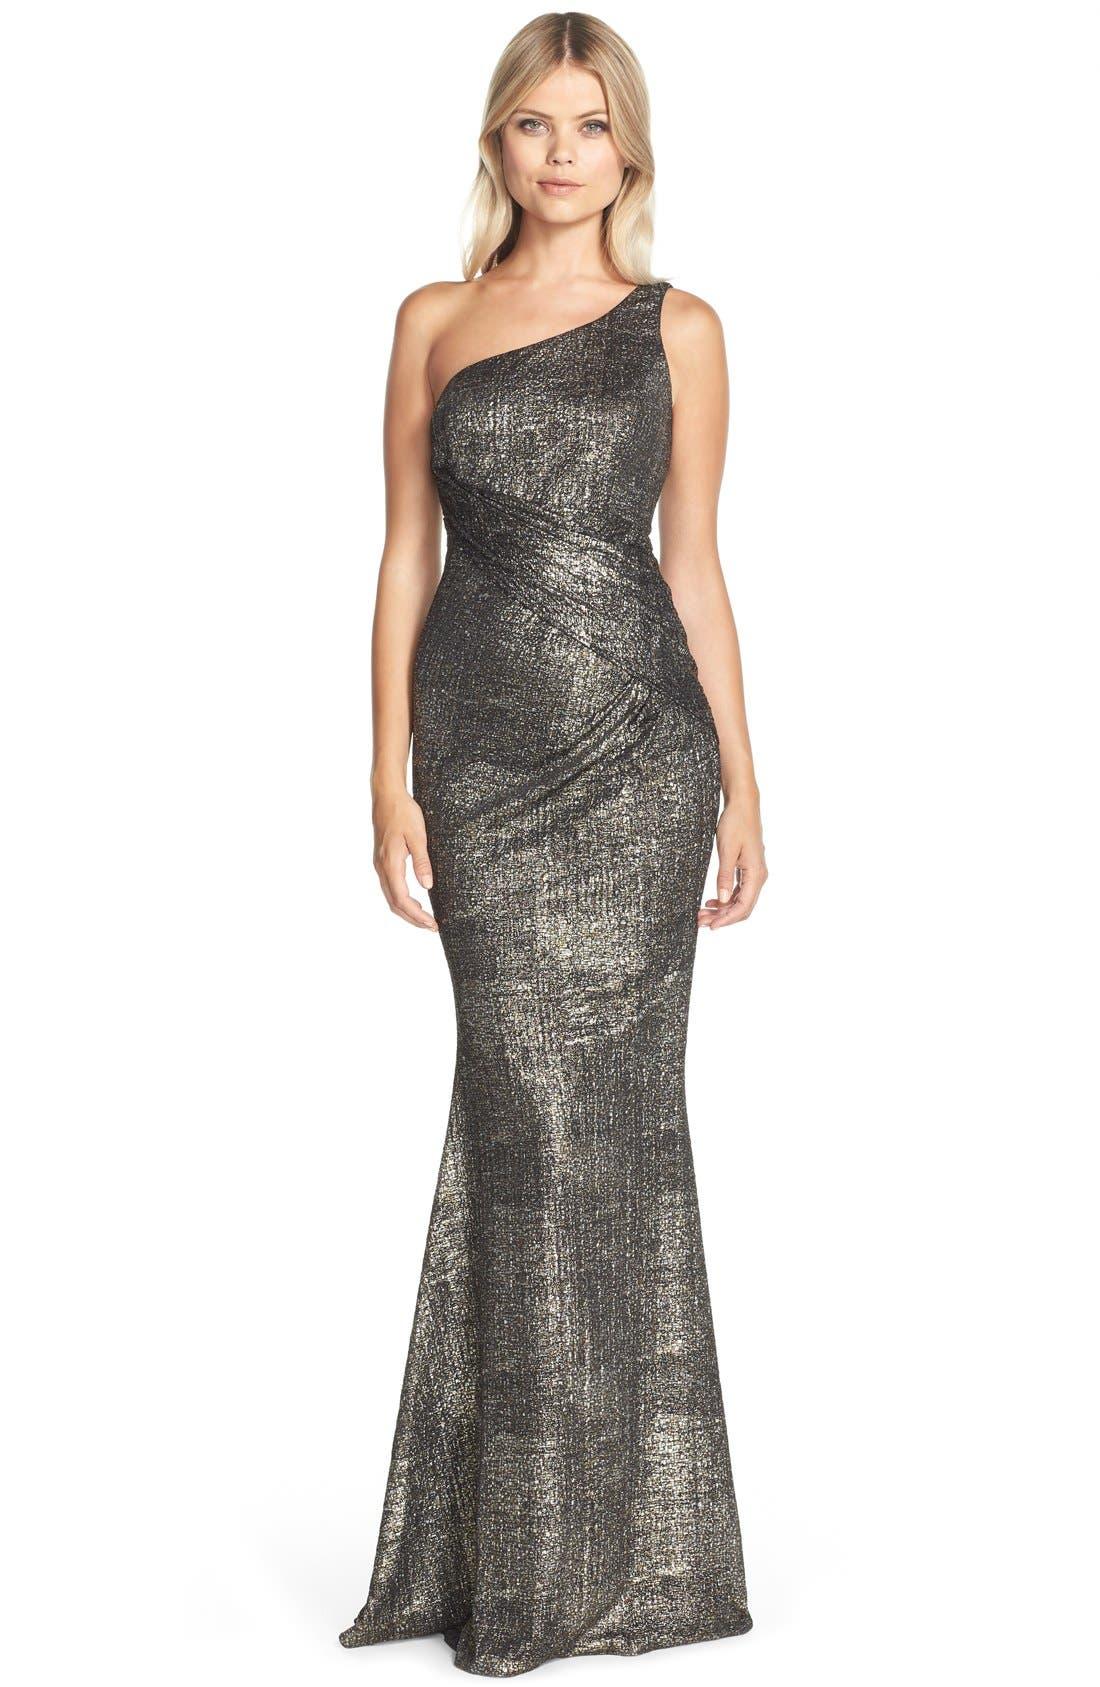 Alternate Image 1 Selected - Jay Godfrey 'Windermere' Metallic Jersey Mermaid Gown